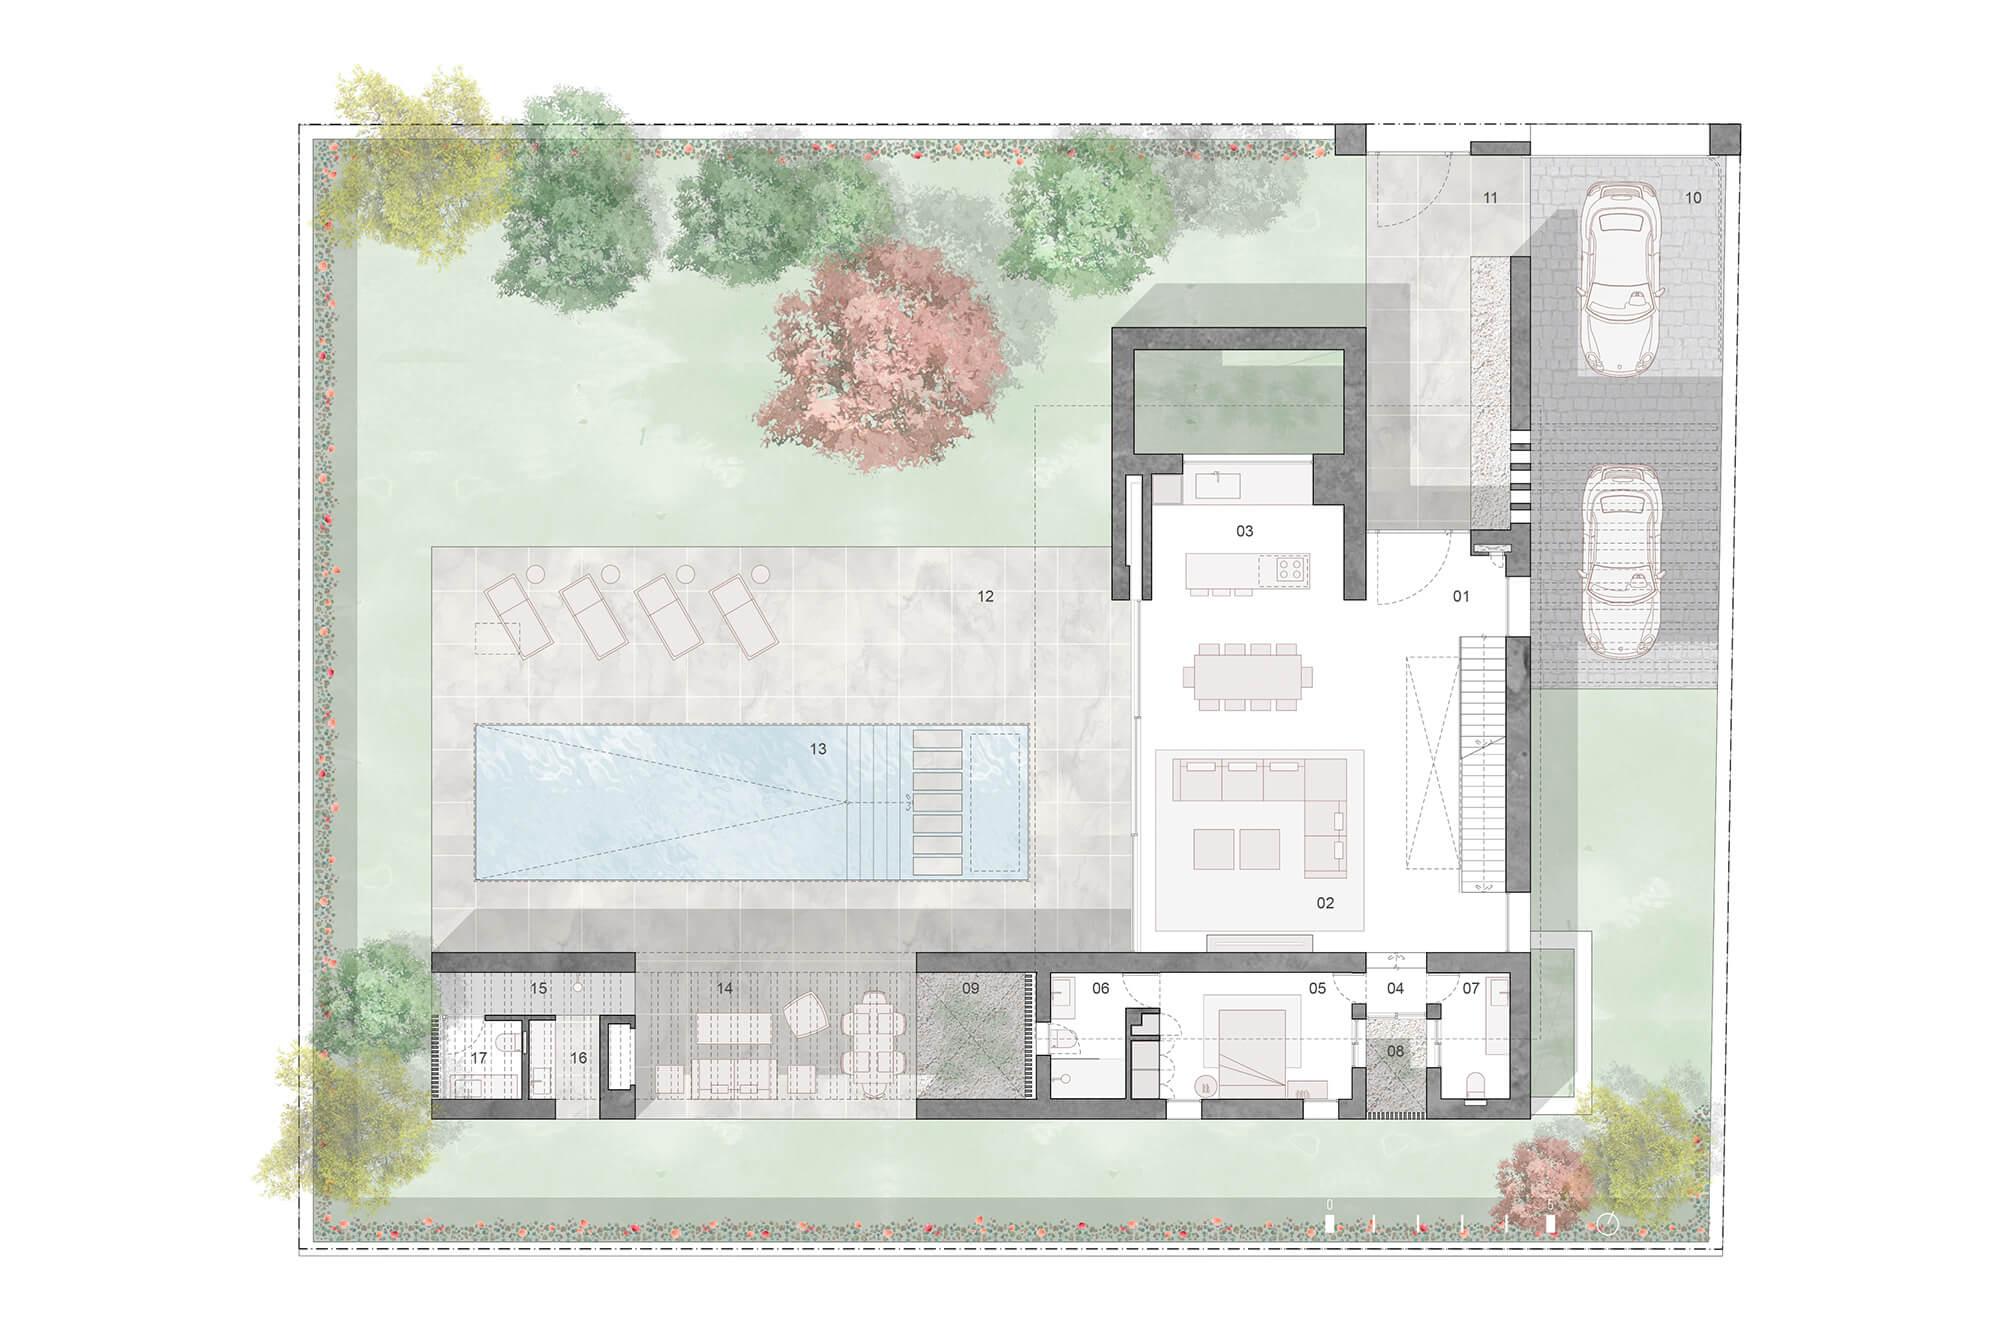 cortijo blanco beach villa vamoz te koop marbella costa del sol spanje nieuwbouw grondplan 4 gelijkvloers